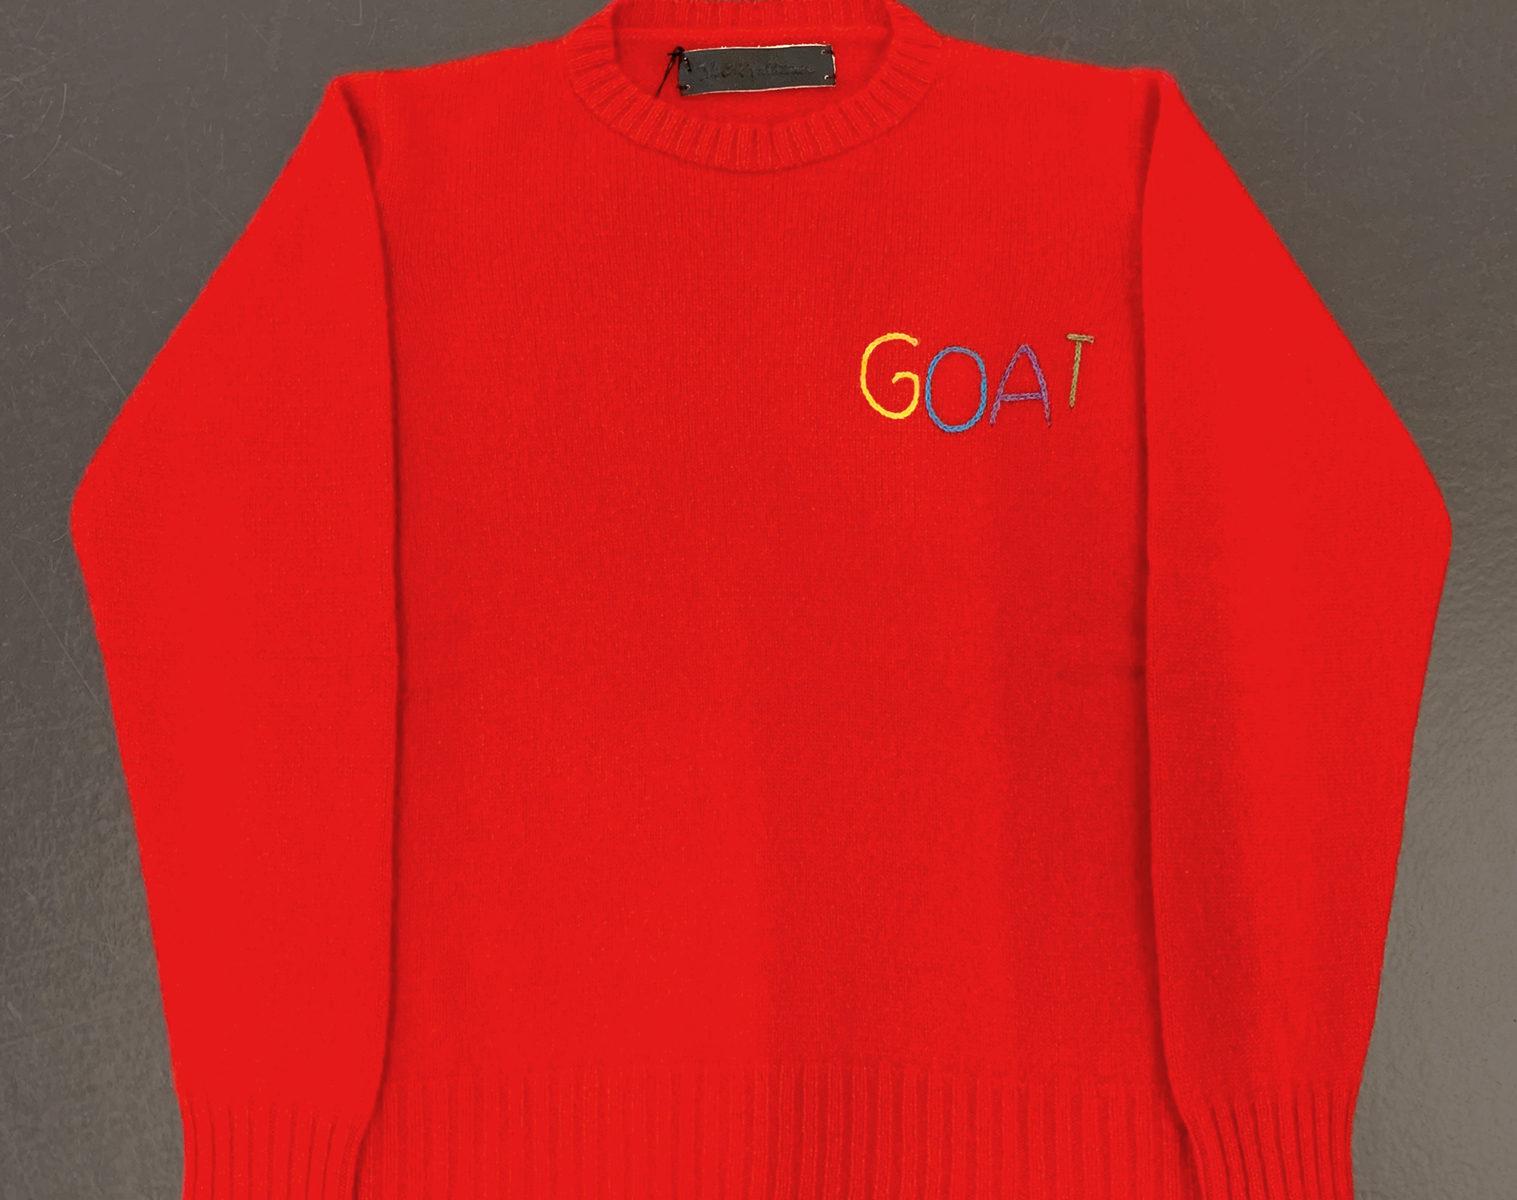 THE EDLER STATESMAN Goat Racing Crew Neck Sweater 1